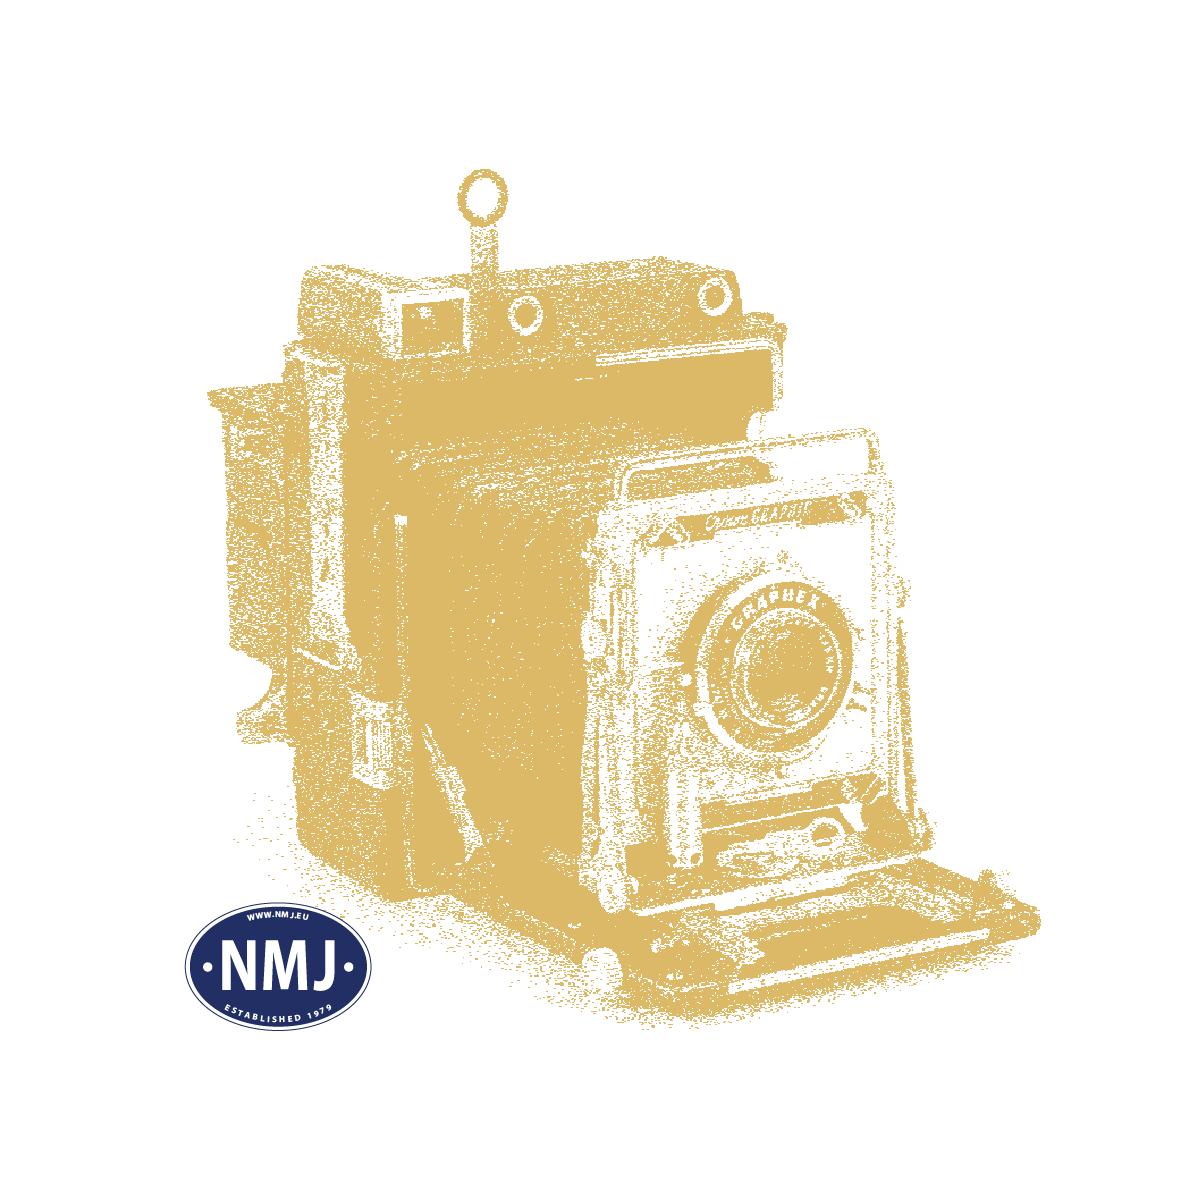 NMJT202.701 - NMJ Topline SJ S11 507489-73715-9 Kino og Bistrovogn, Sort